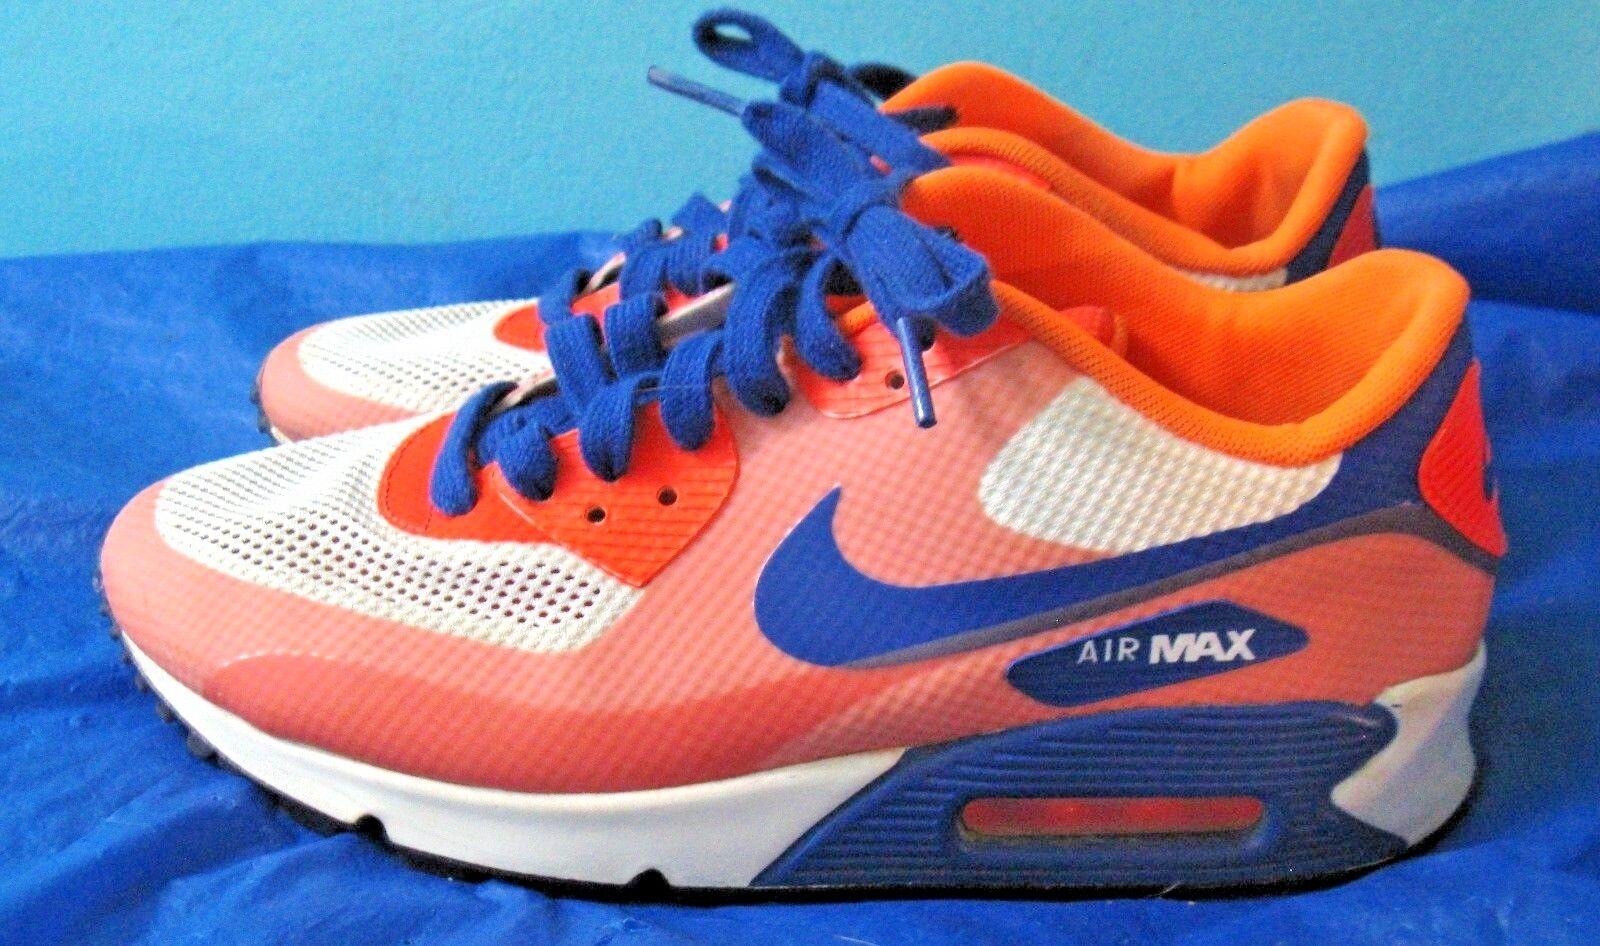 Nike Air Max 90 HYPERFUSE PREMIUM 454460-100  Hyper 9.5) Blue Citrus Crms (Sz 9.5) Hyper d5448c